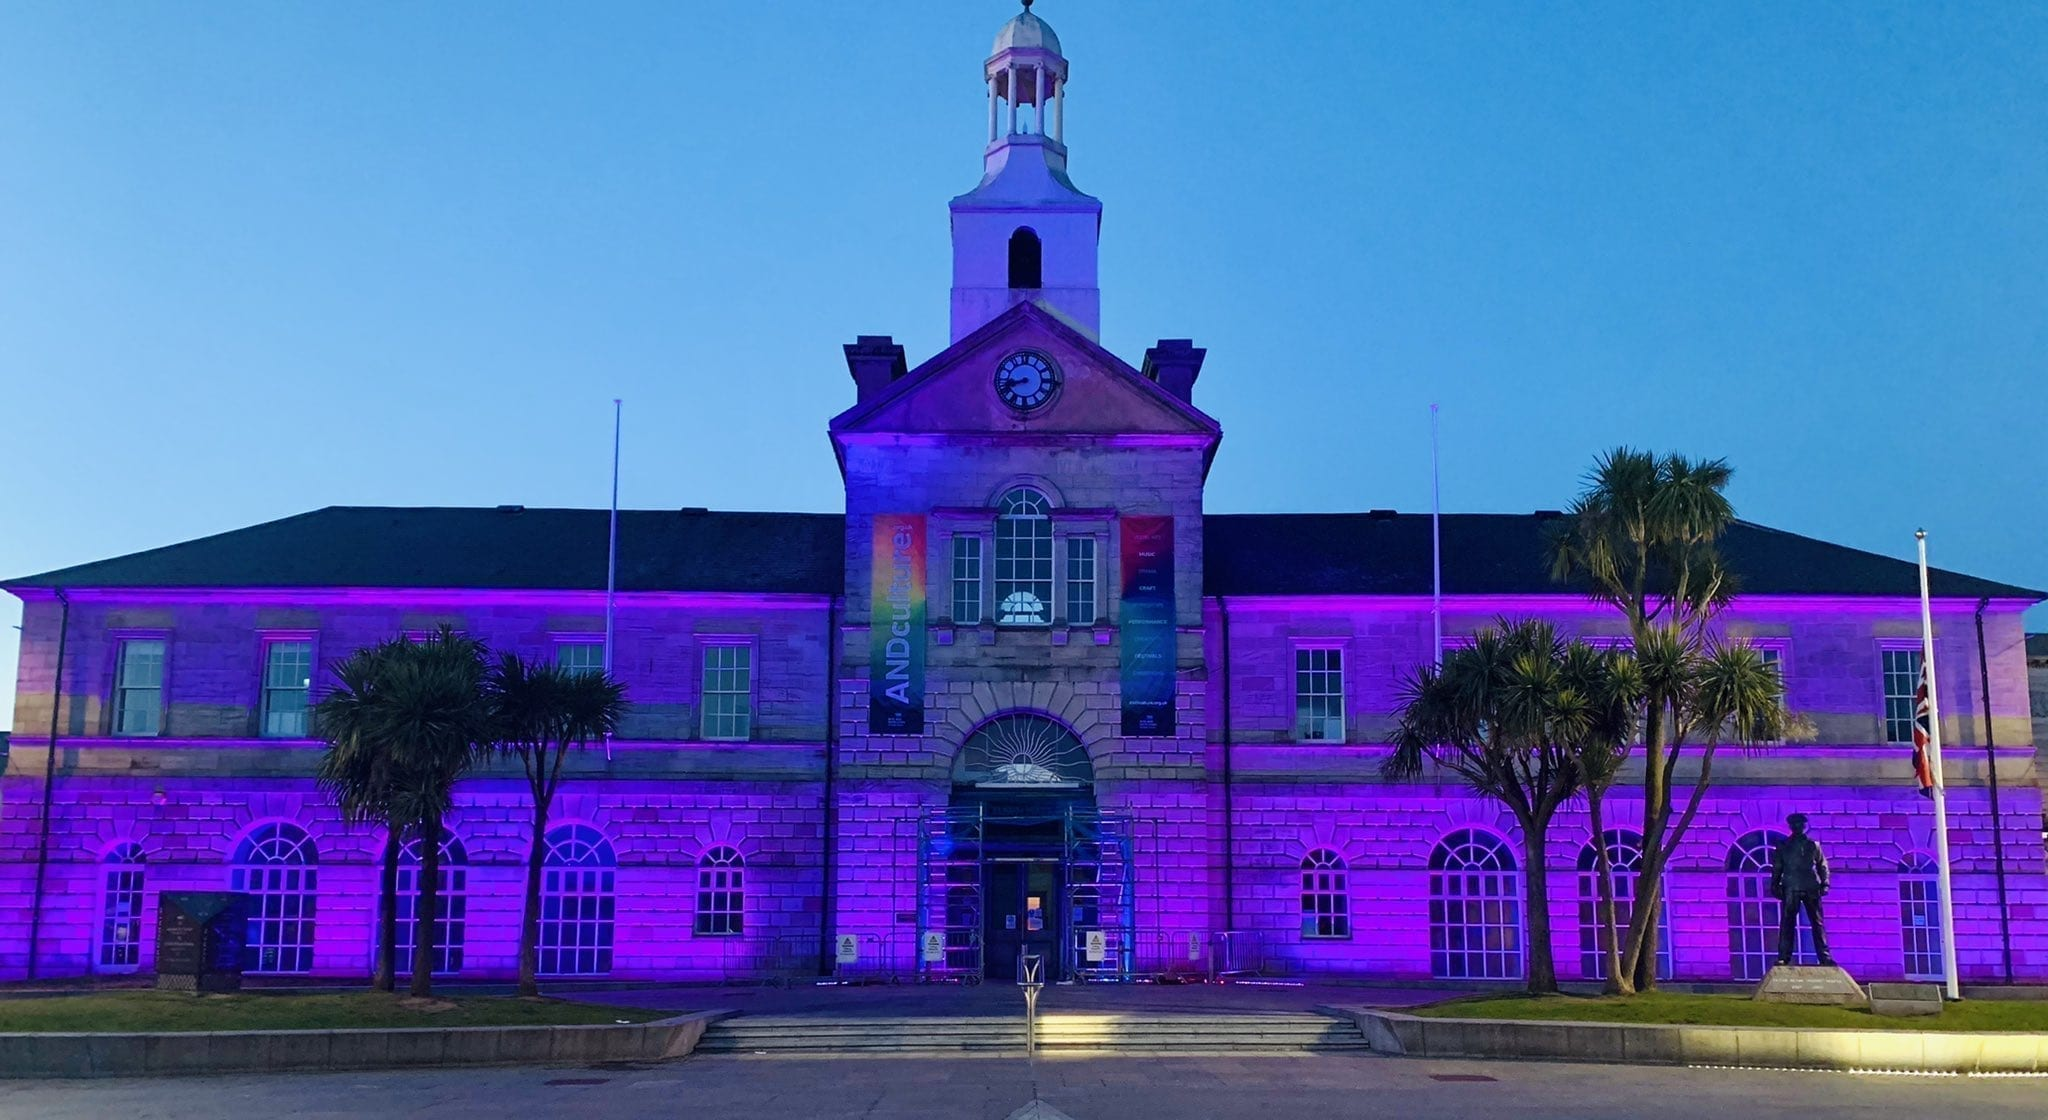 Council apology over Lyra lights failure